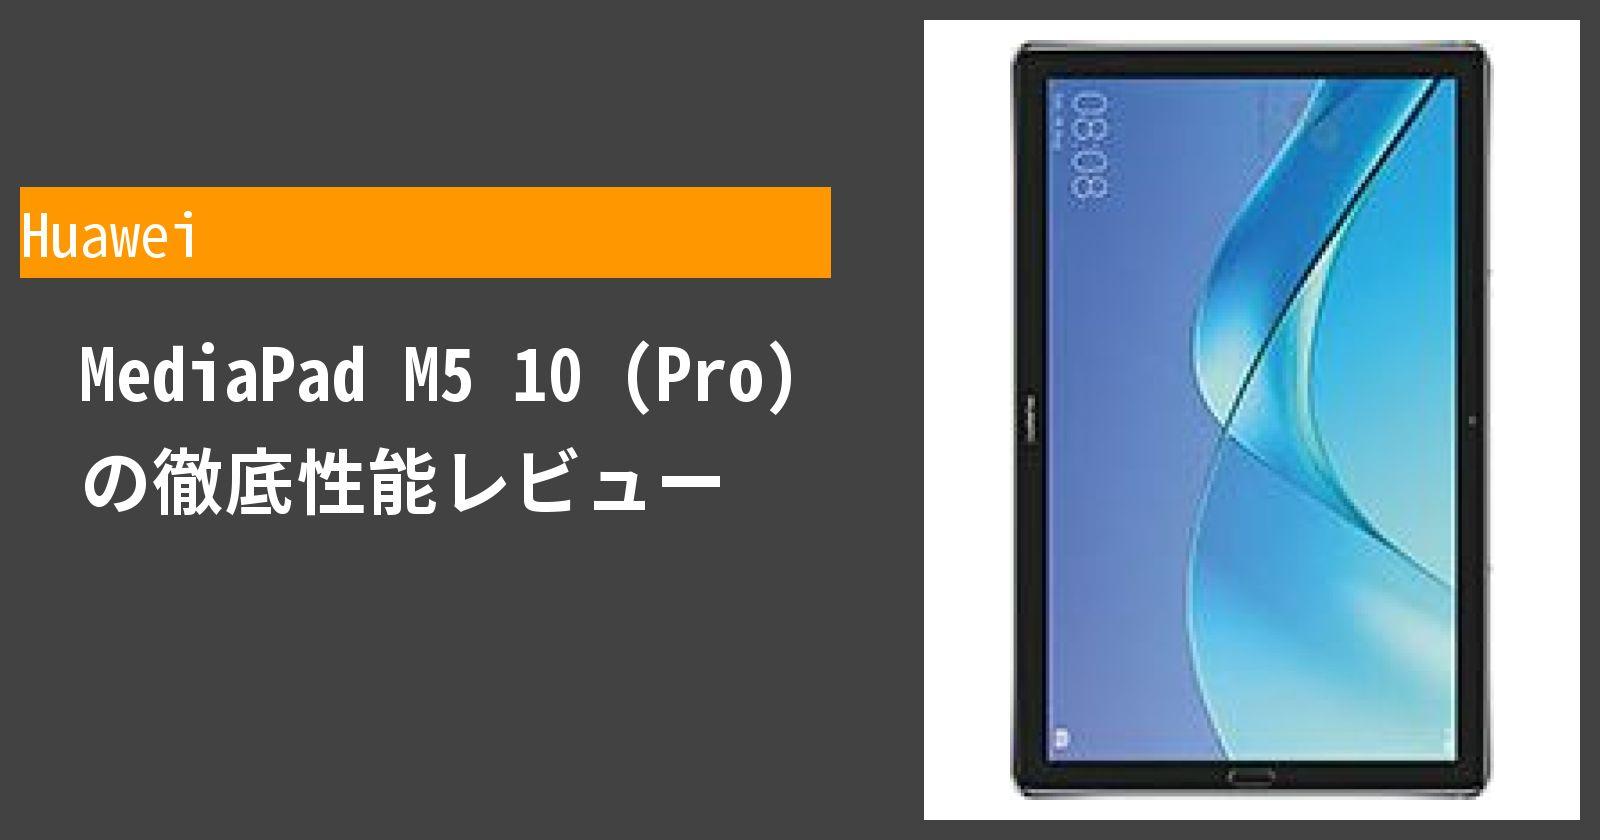 Huawei MediaPad M5 10 (Pro) の徹底性能レビュー